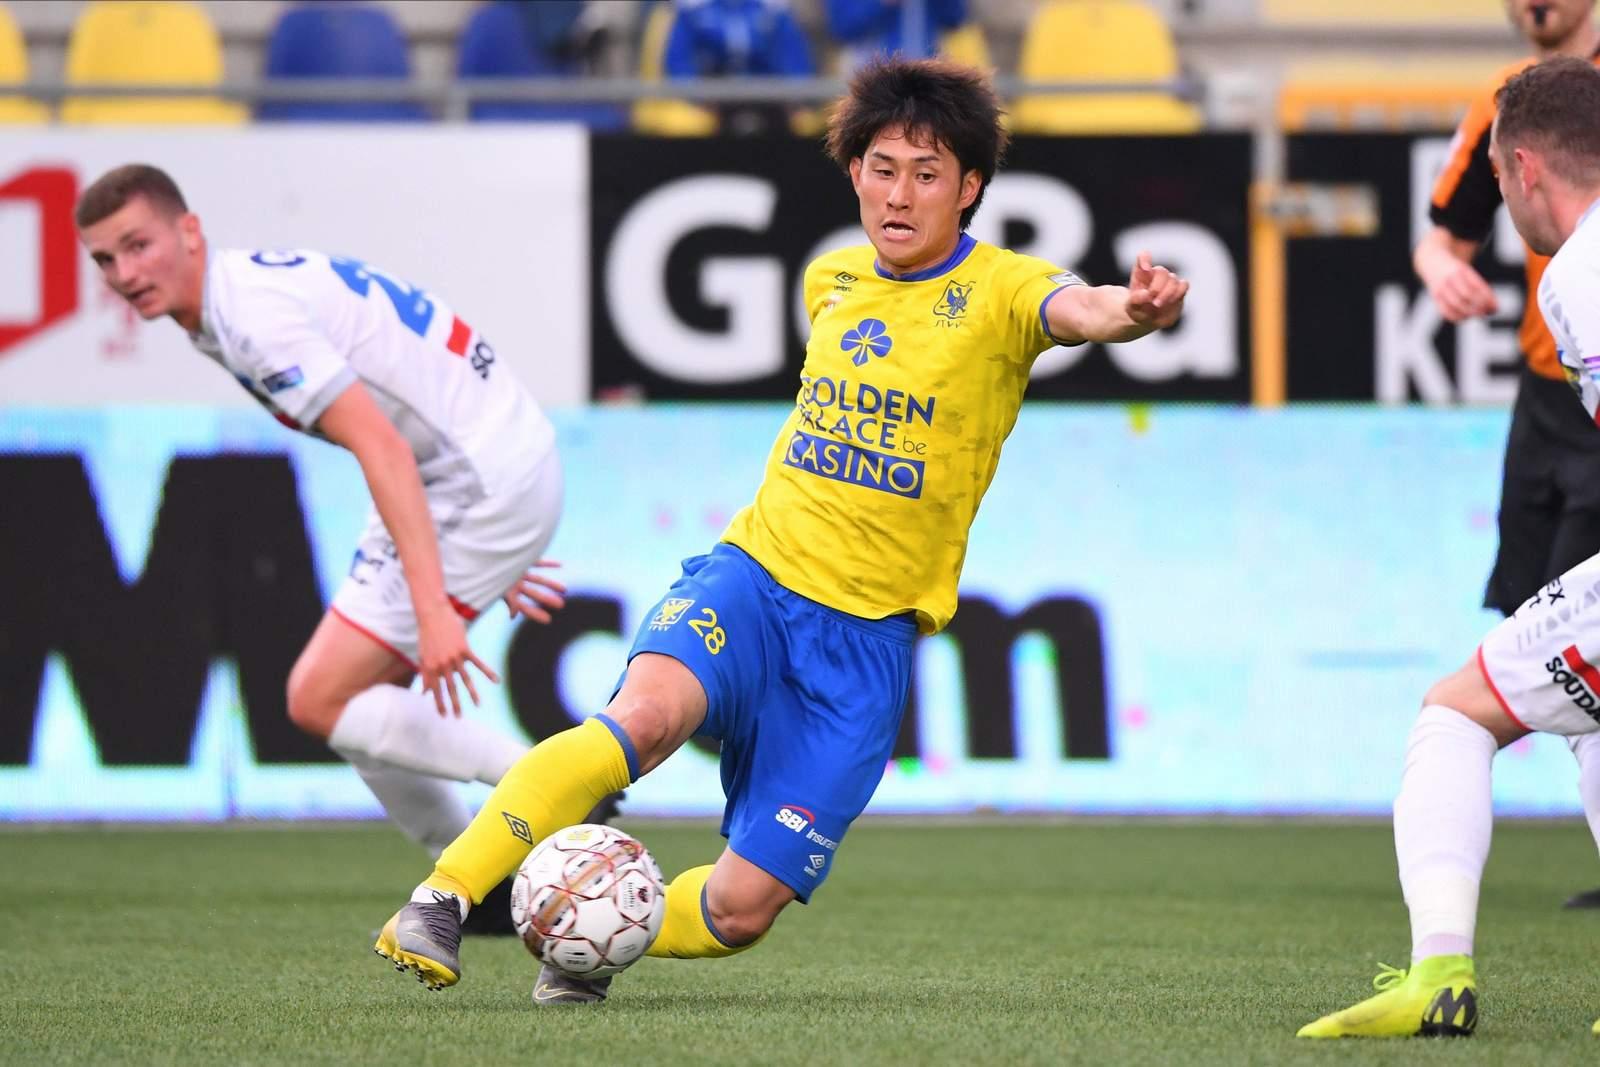 Takahiro Sekine in Aktion.